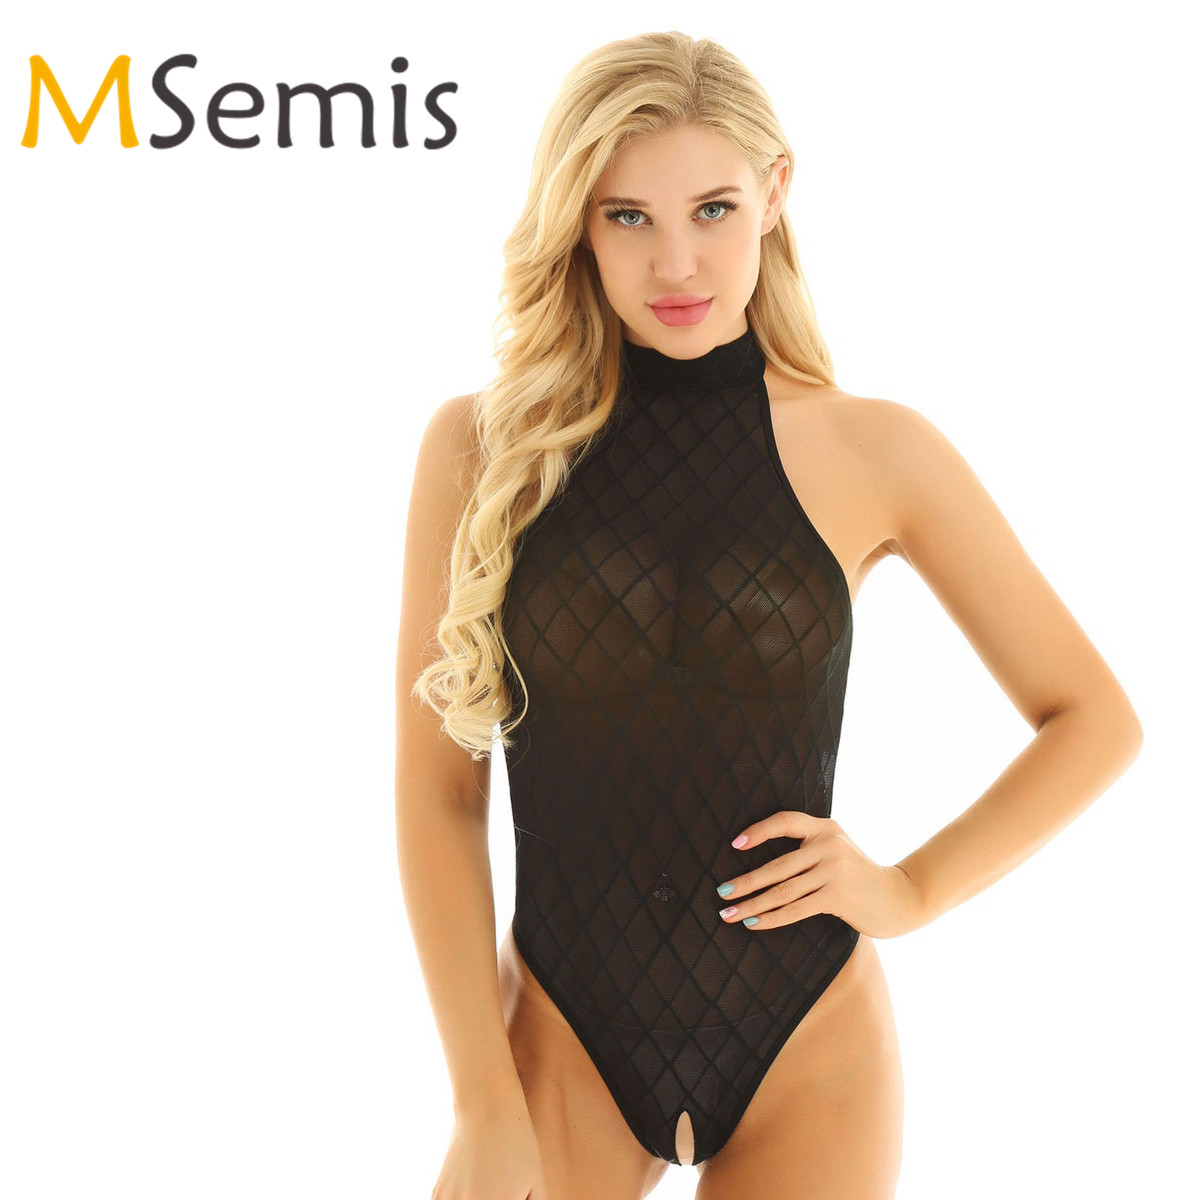 Women's Crotchless Swimsuit Bodysuit See Through Swimwear Mesh High Cut Open Crotch Gymnastics Leotard Bodysuit Bath Clothes